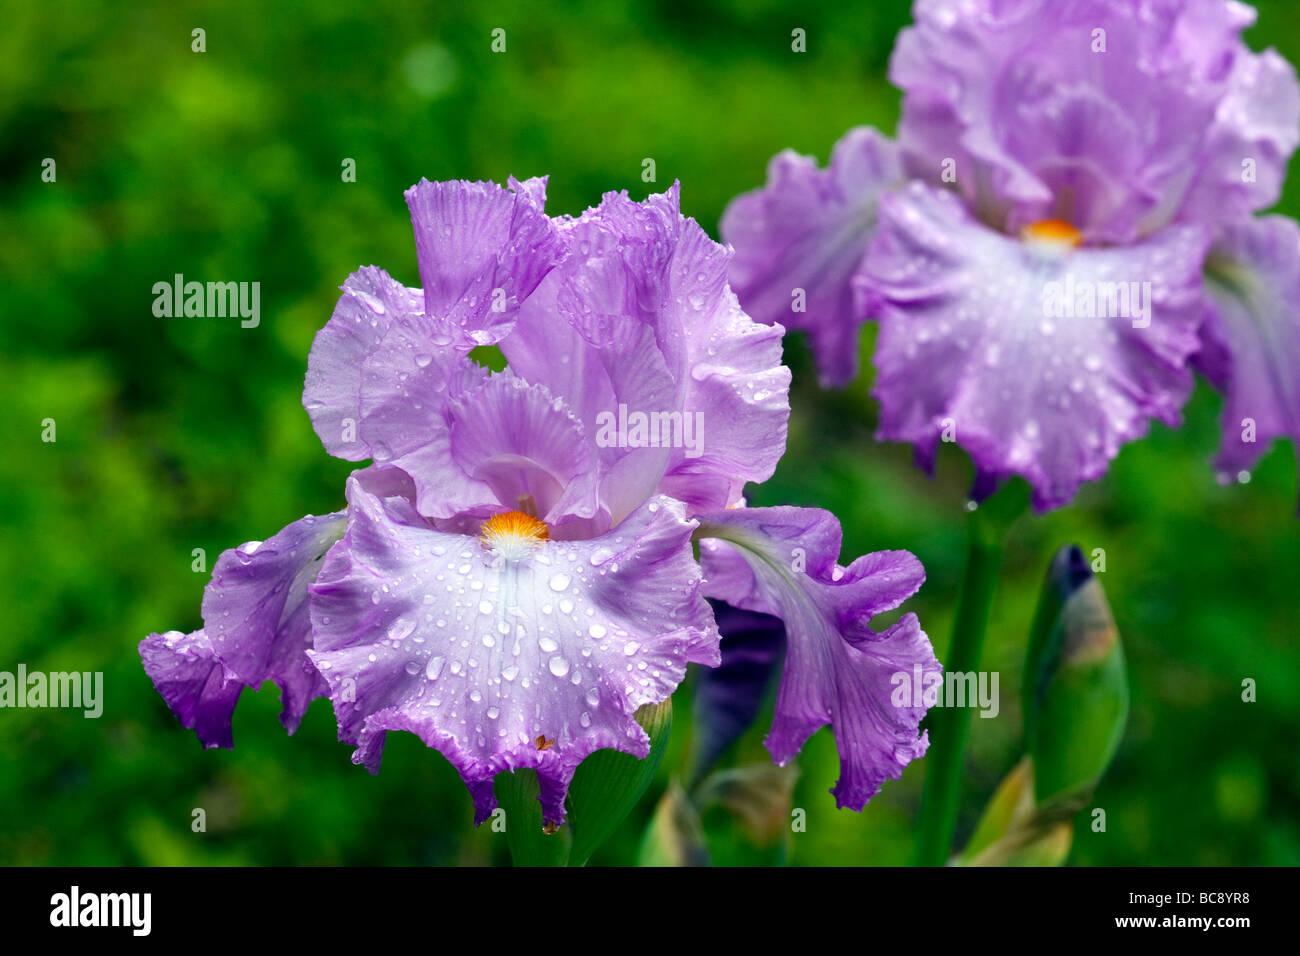 Purple iris flower after rain stock photo 24783676 alamy purple iris flower after rain izmirmasajfo